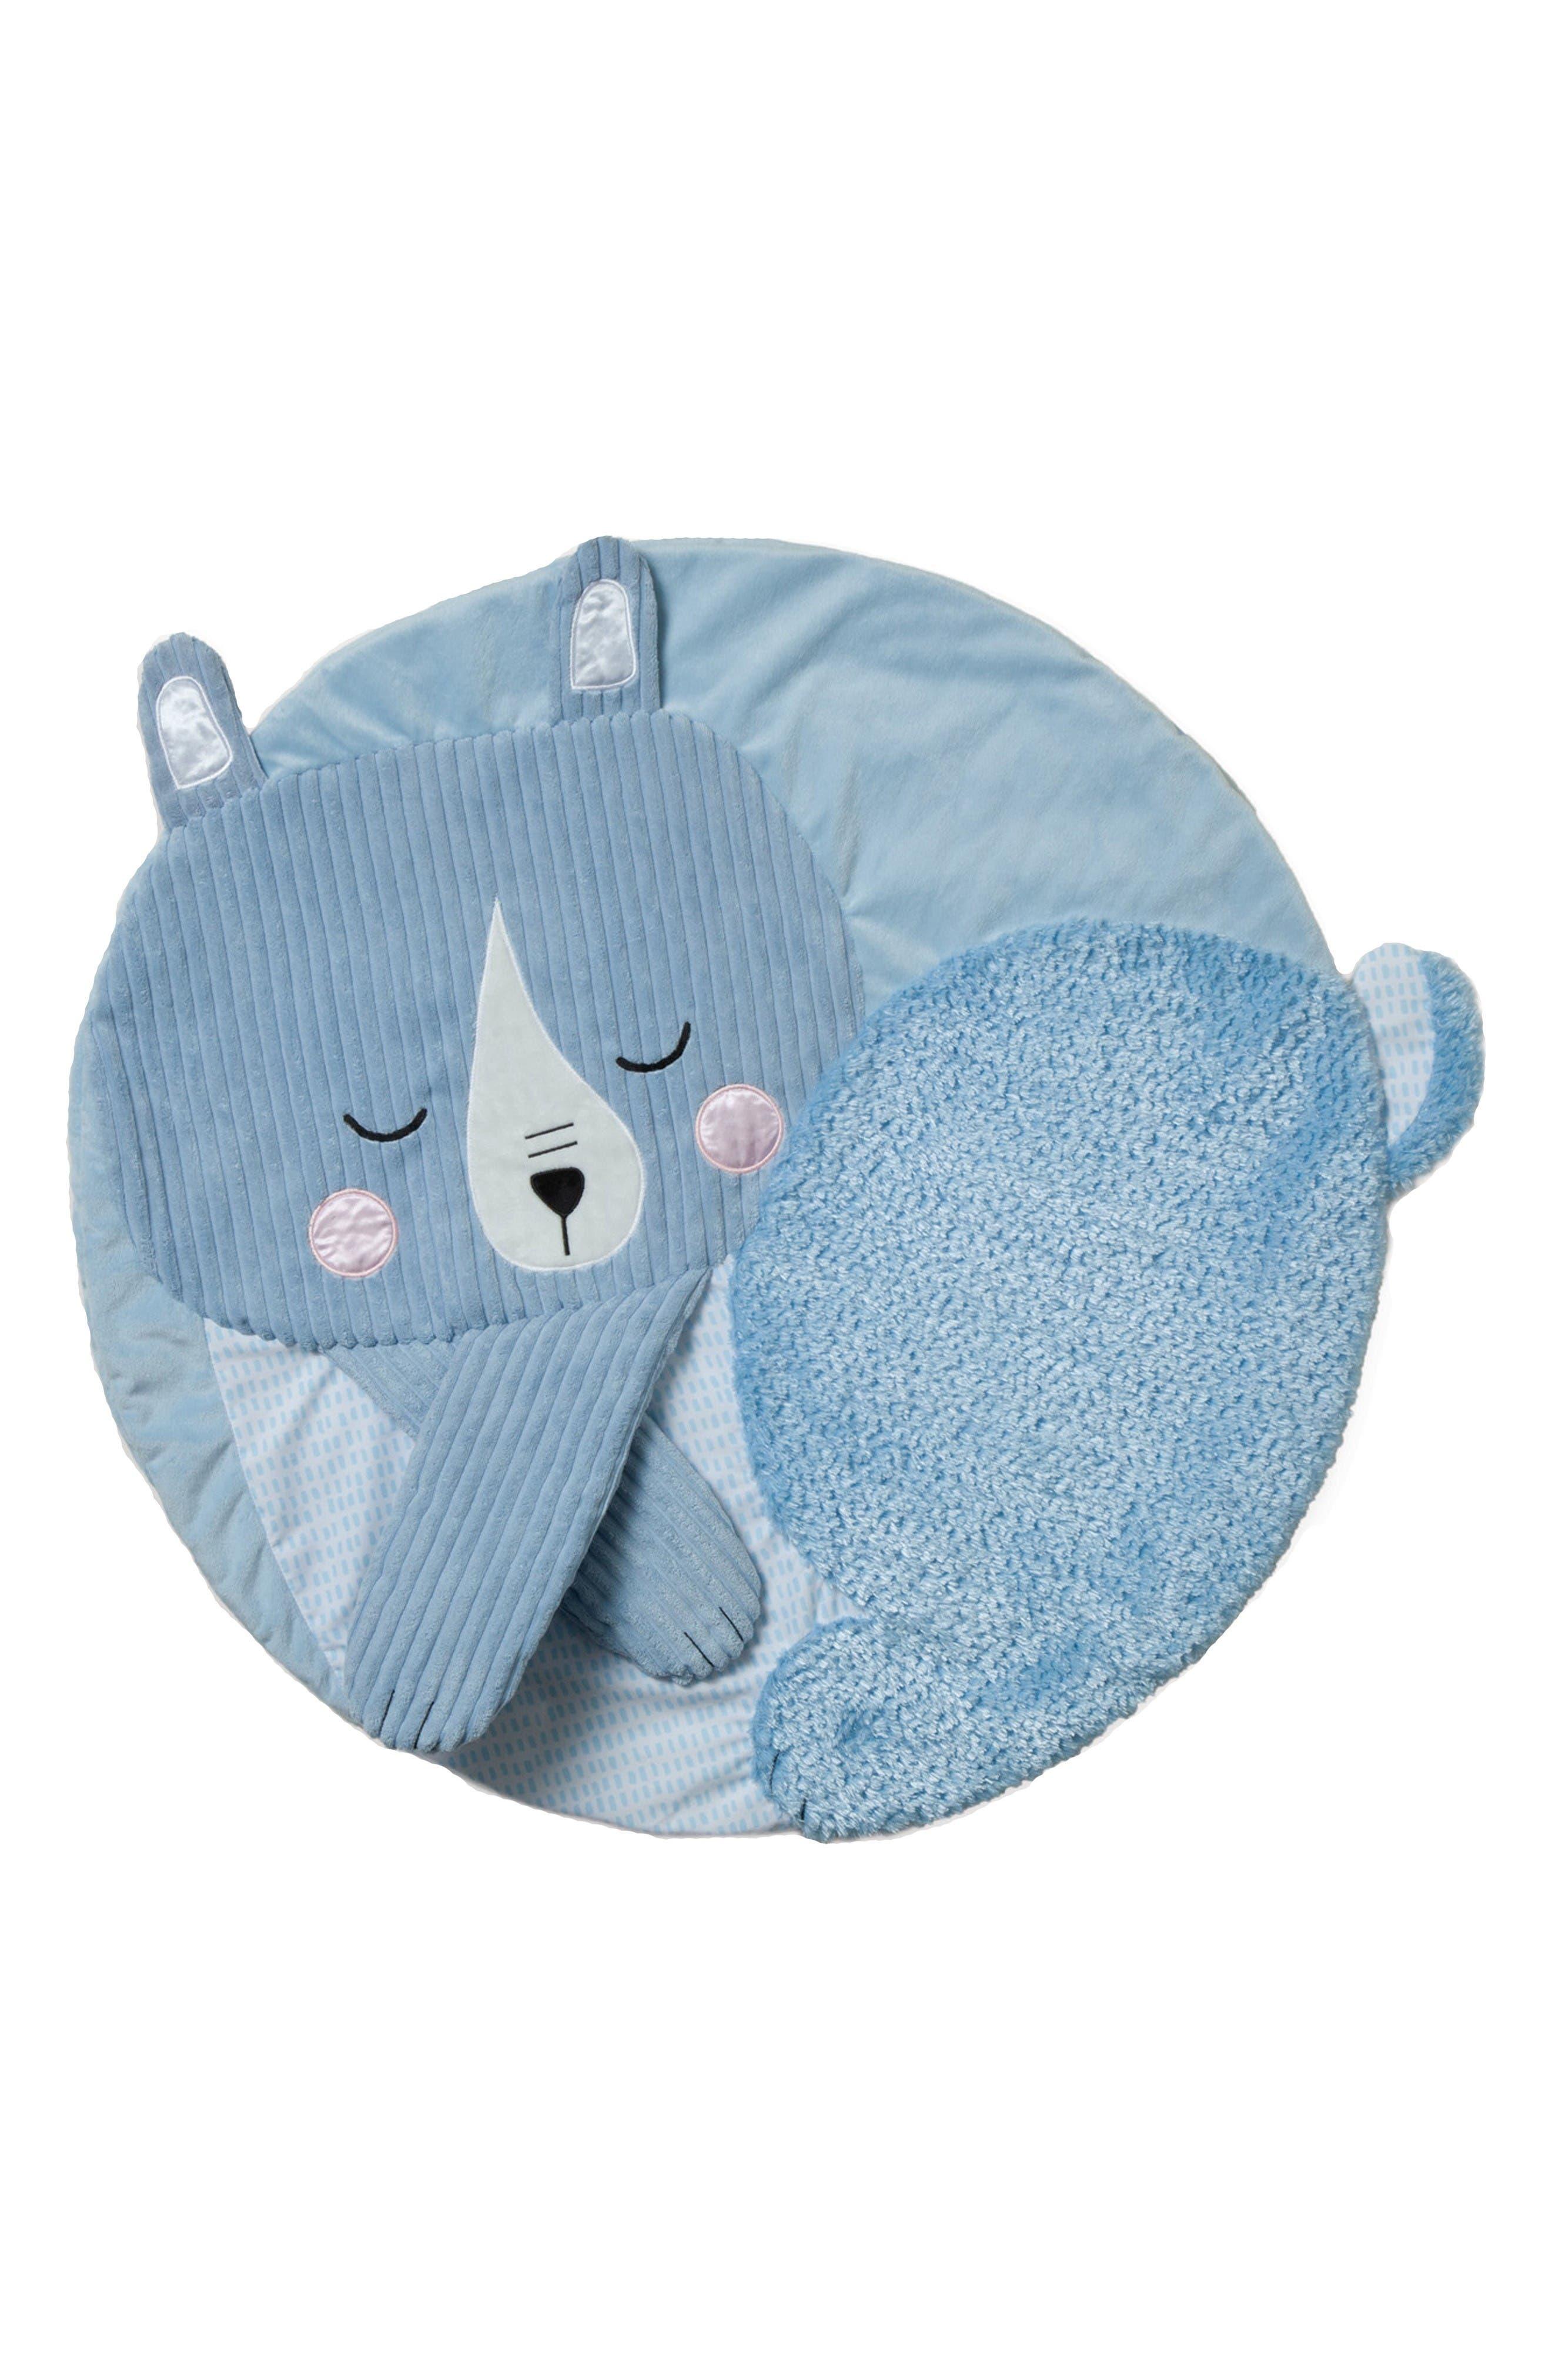 Alternate Image 1 Selected - Manhattan Toy Bear Tactile Playmat